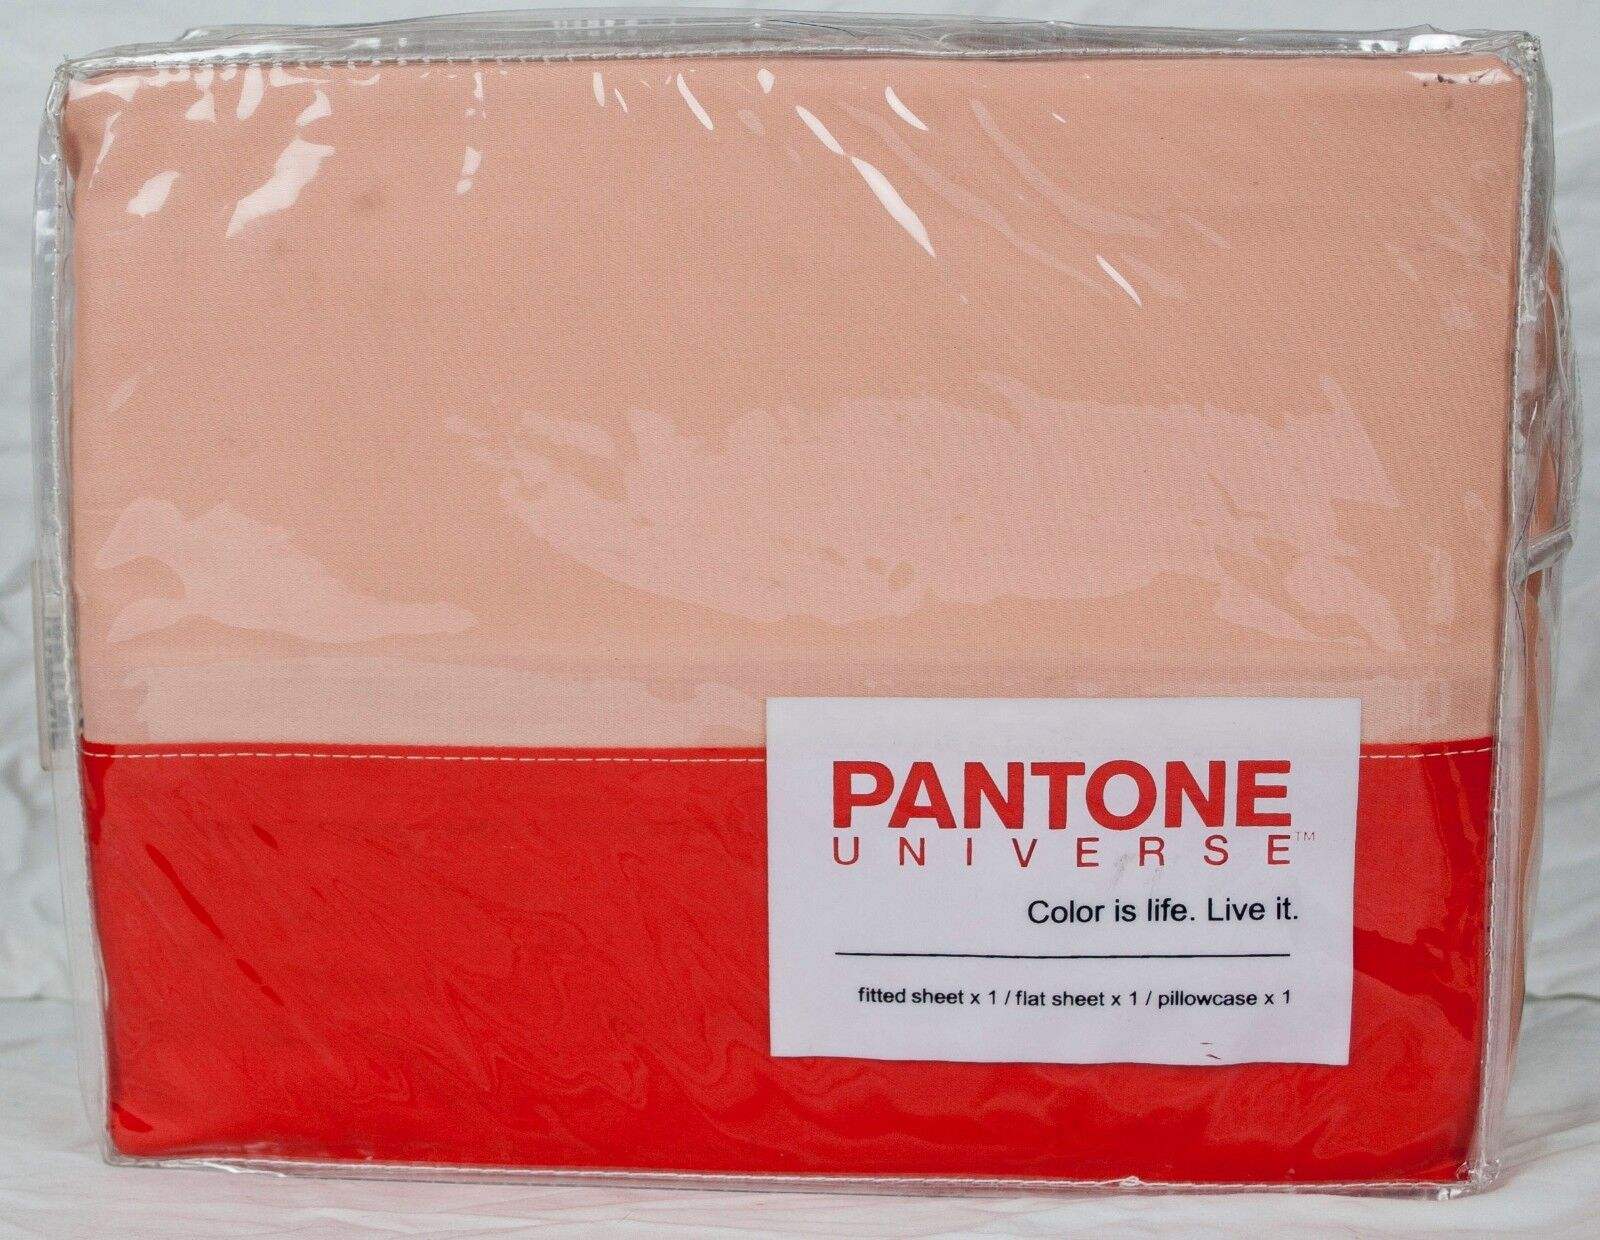 Pantone Universe Tonal Cuff Twin Sheet Set-Tangerine Tango Peach Parfait